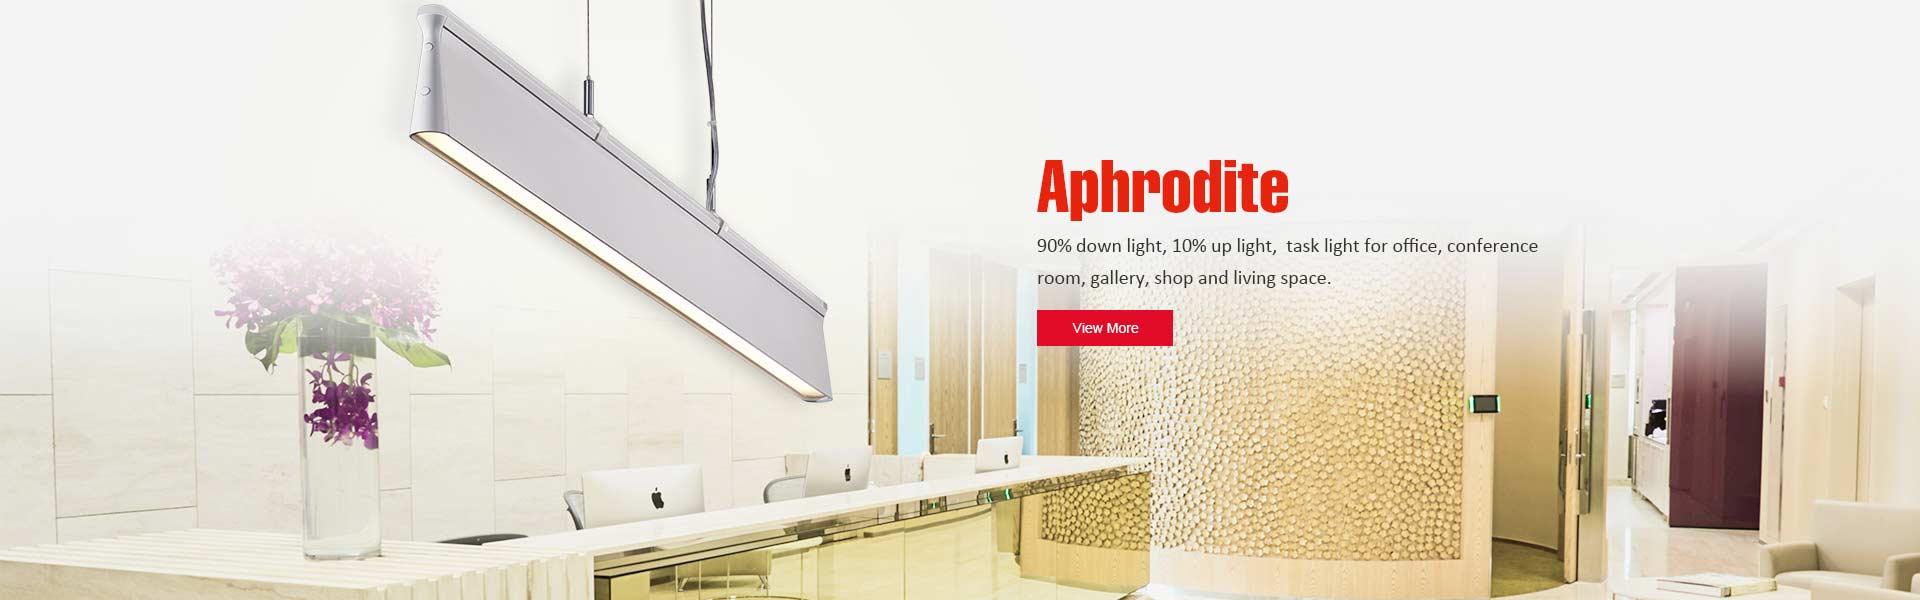 LED Linear Lamp, LED Office Lighting Fixture, Fluorescent Lighting Fixture,  LED Table Lamp Supplier